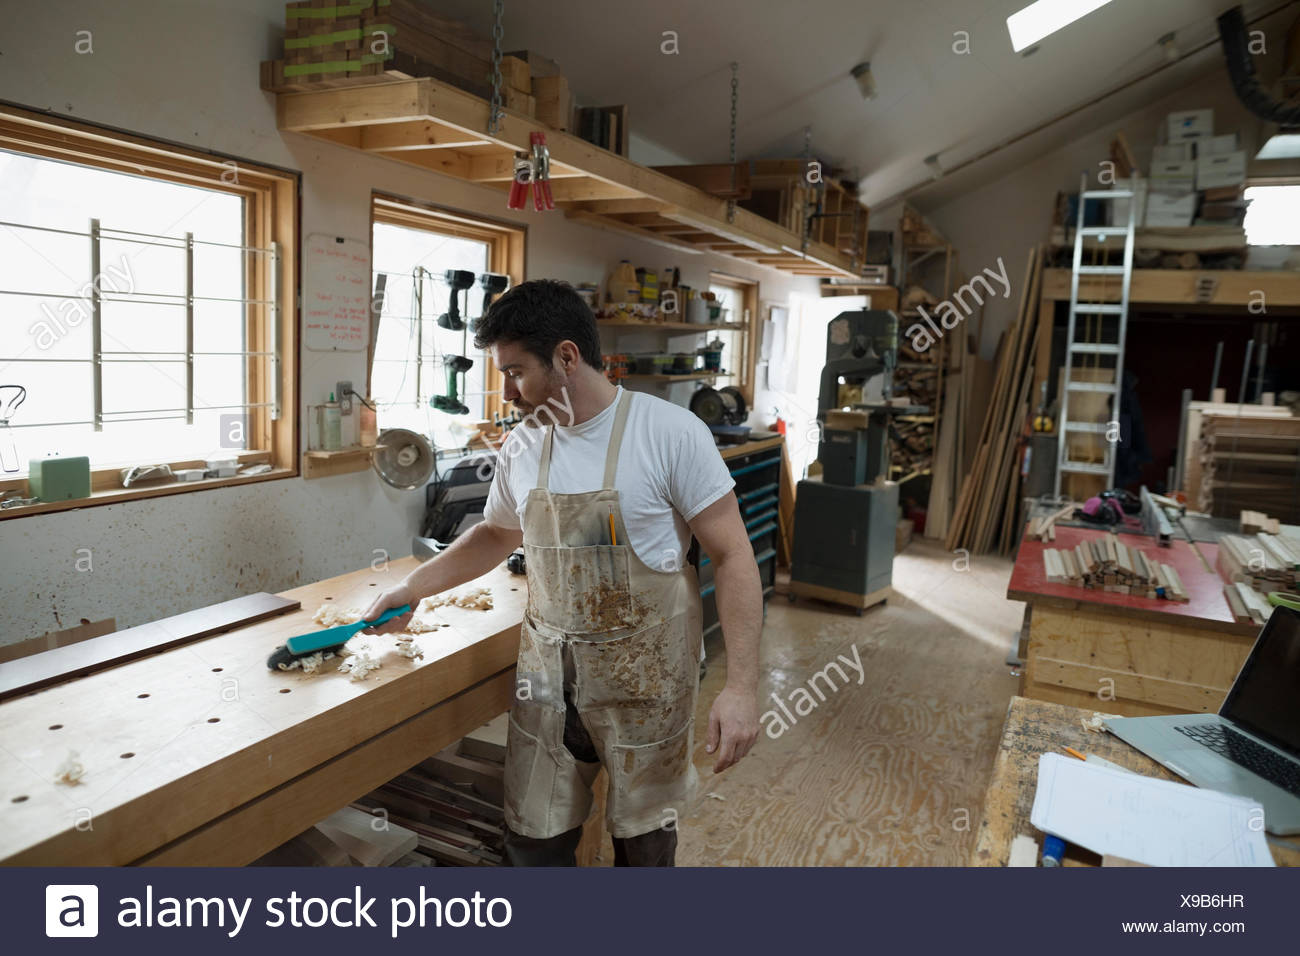 Menuisier travaillant en atelier Photo Stock